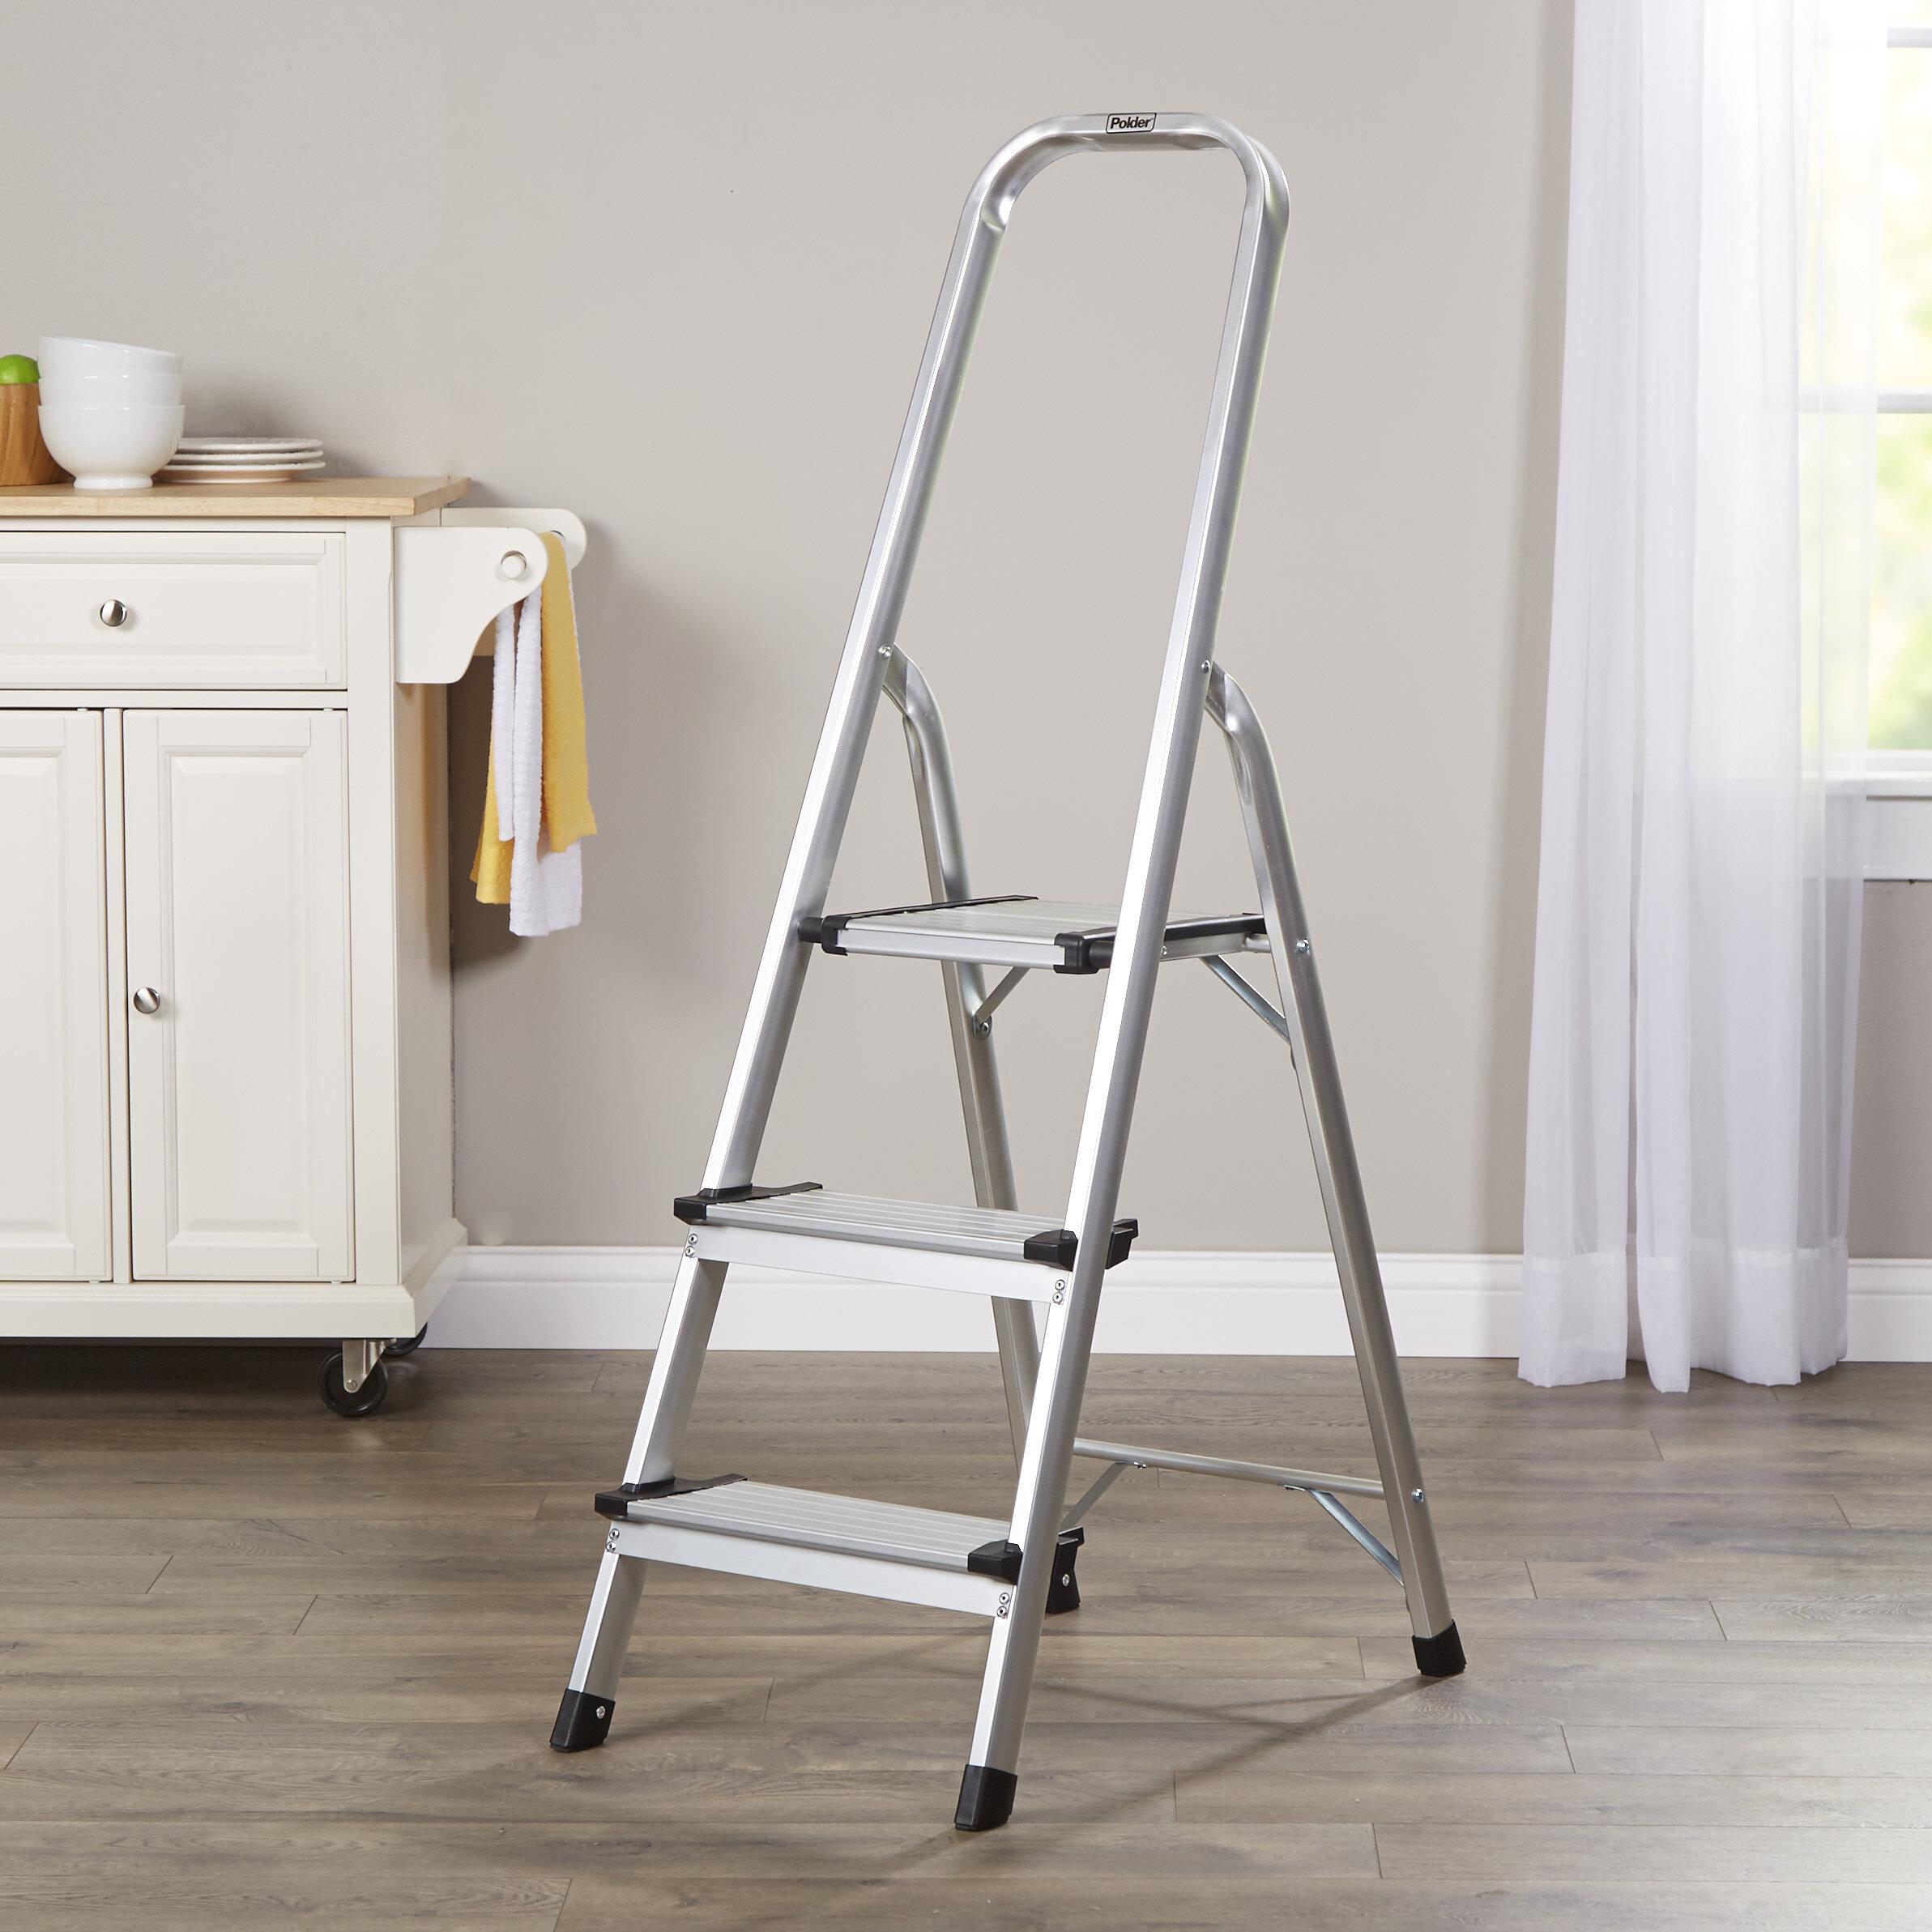 Wayfair Basics Aluminum 3 Step Ultralight Folding Stool With 225 Lb Load Capacity Reviews